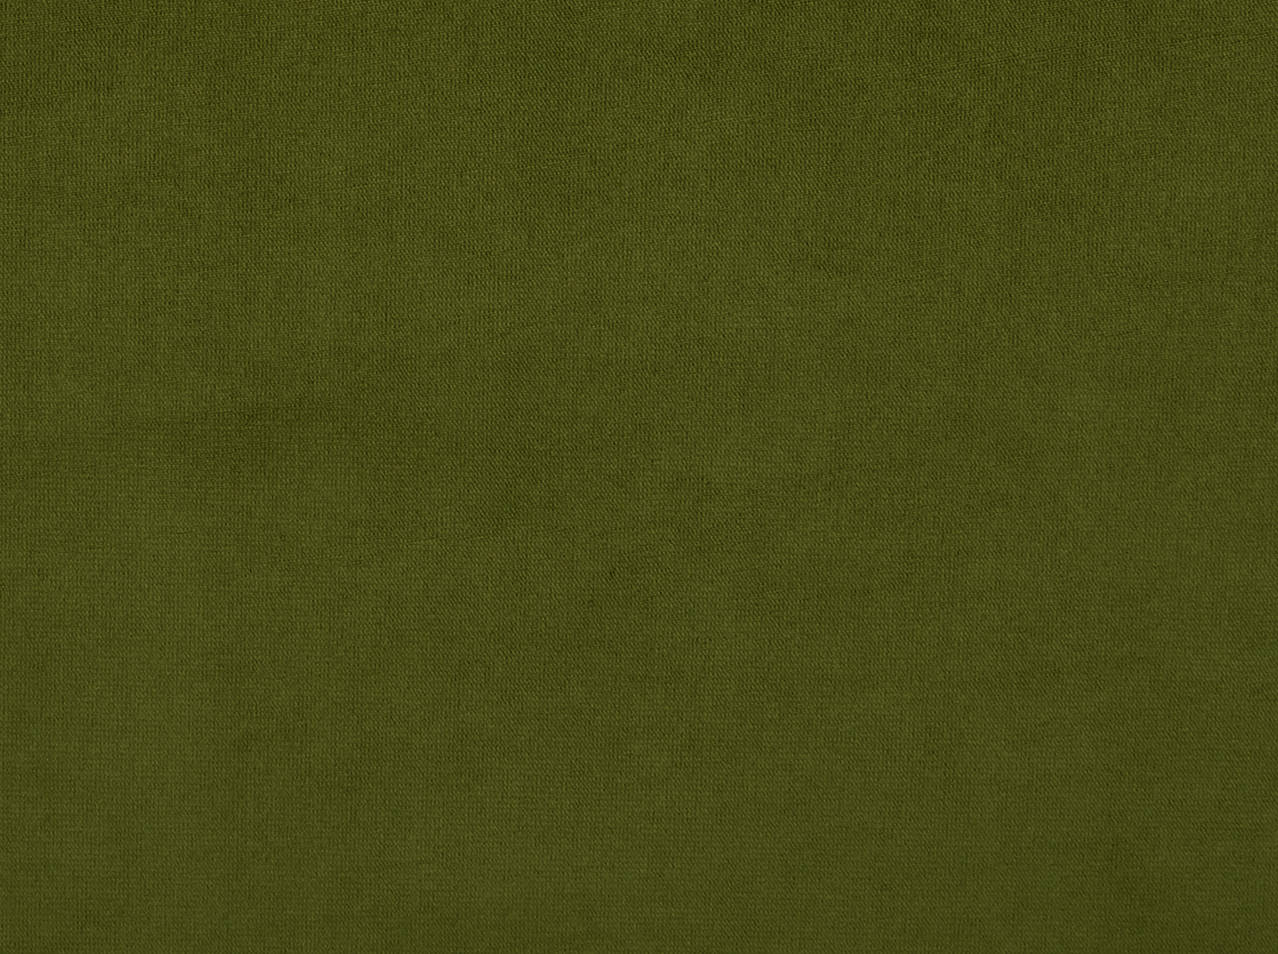 Covington Contract Products Color Khaki Green Aphrodite 203 Aloe